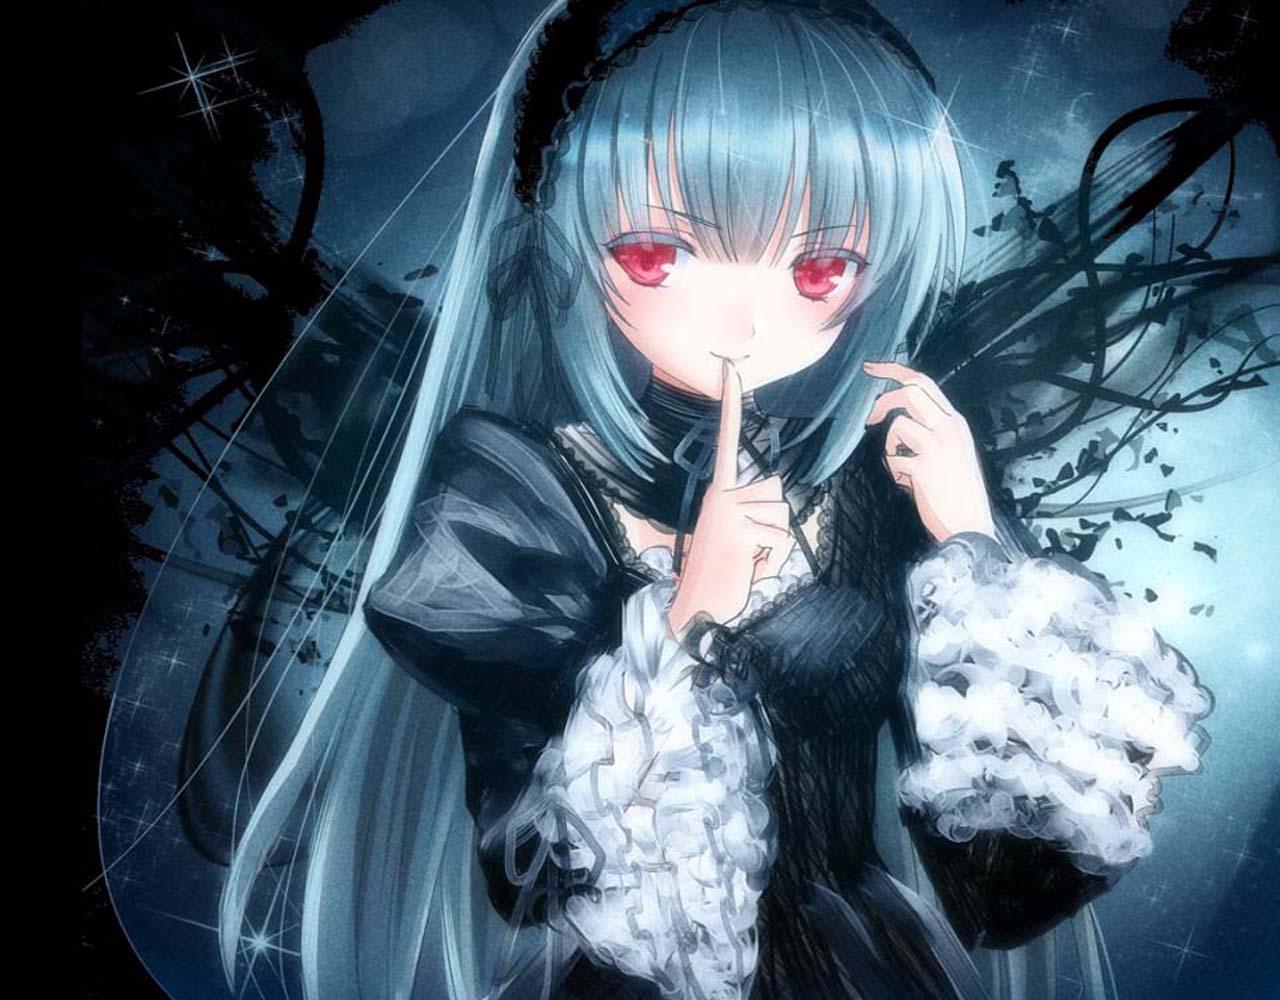 Gambar gambar anime 3 hacanimedream girl wallpaper keren - Foto anime keren hd ...